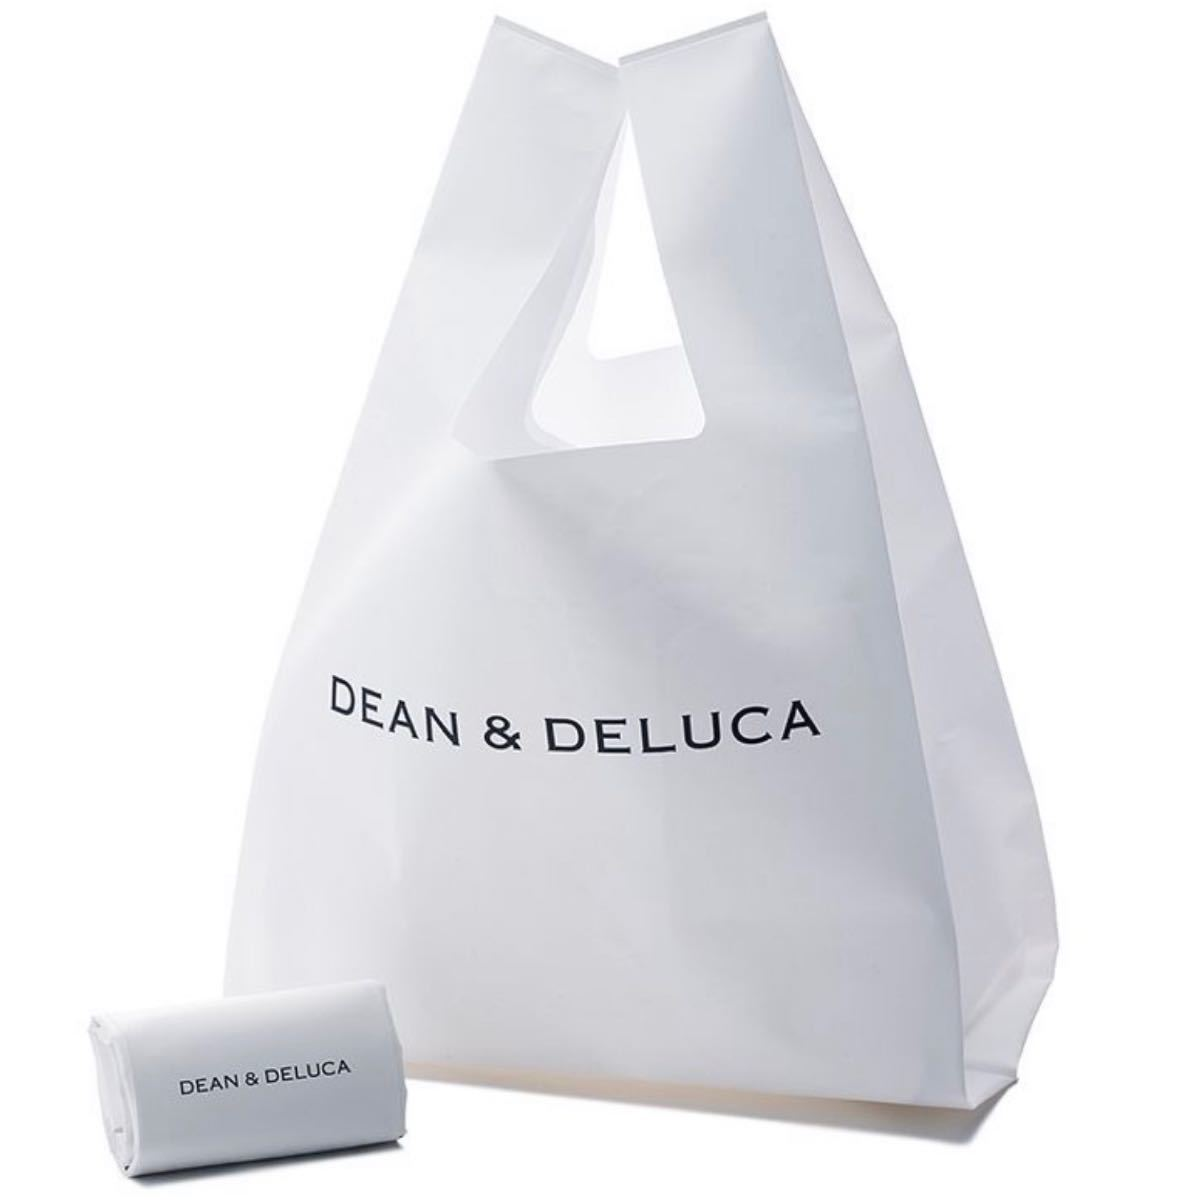 DEAN&DELUCA3点セット マーケットトートバッグ ミニマムエコバッグ